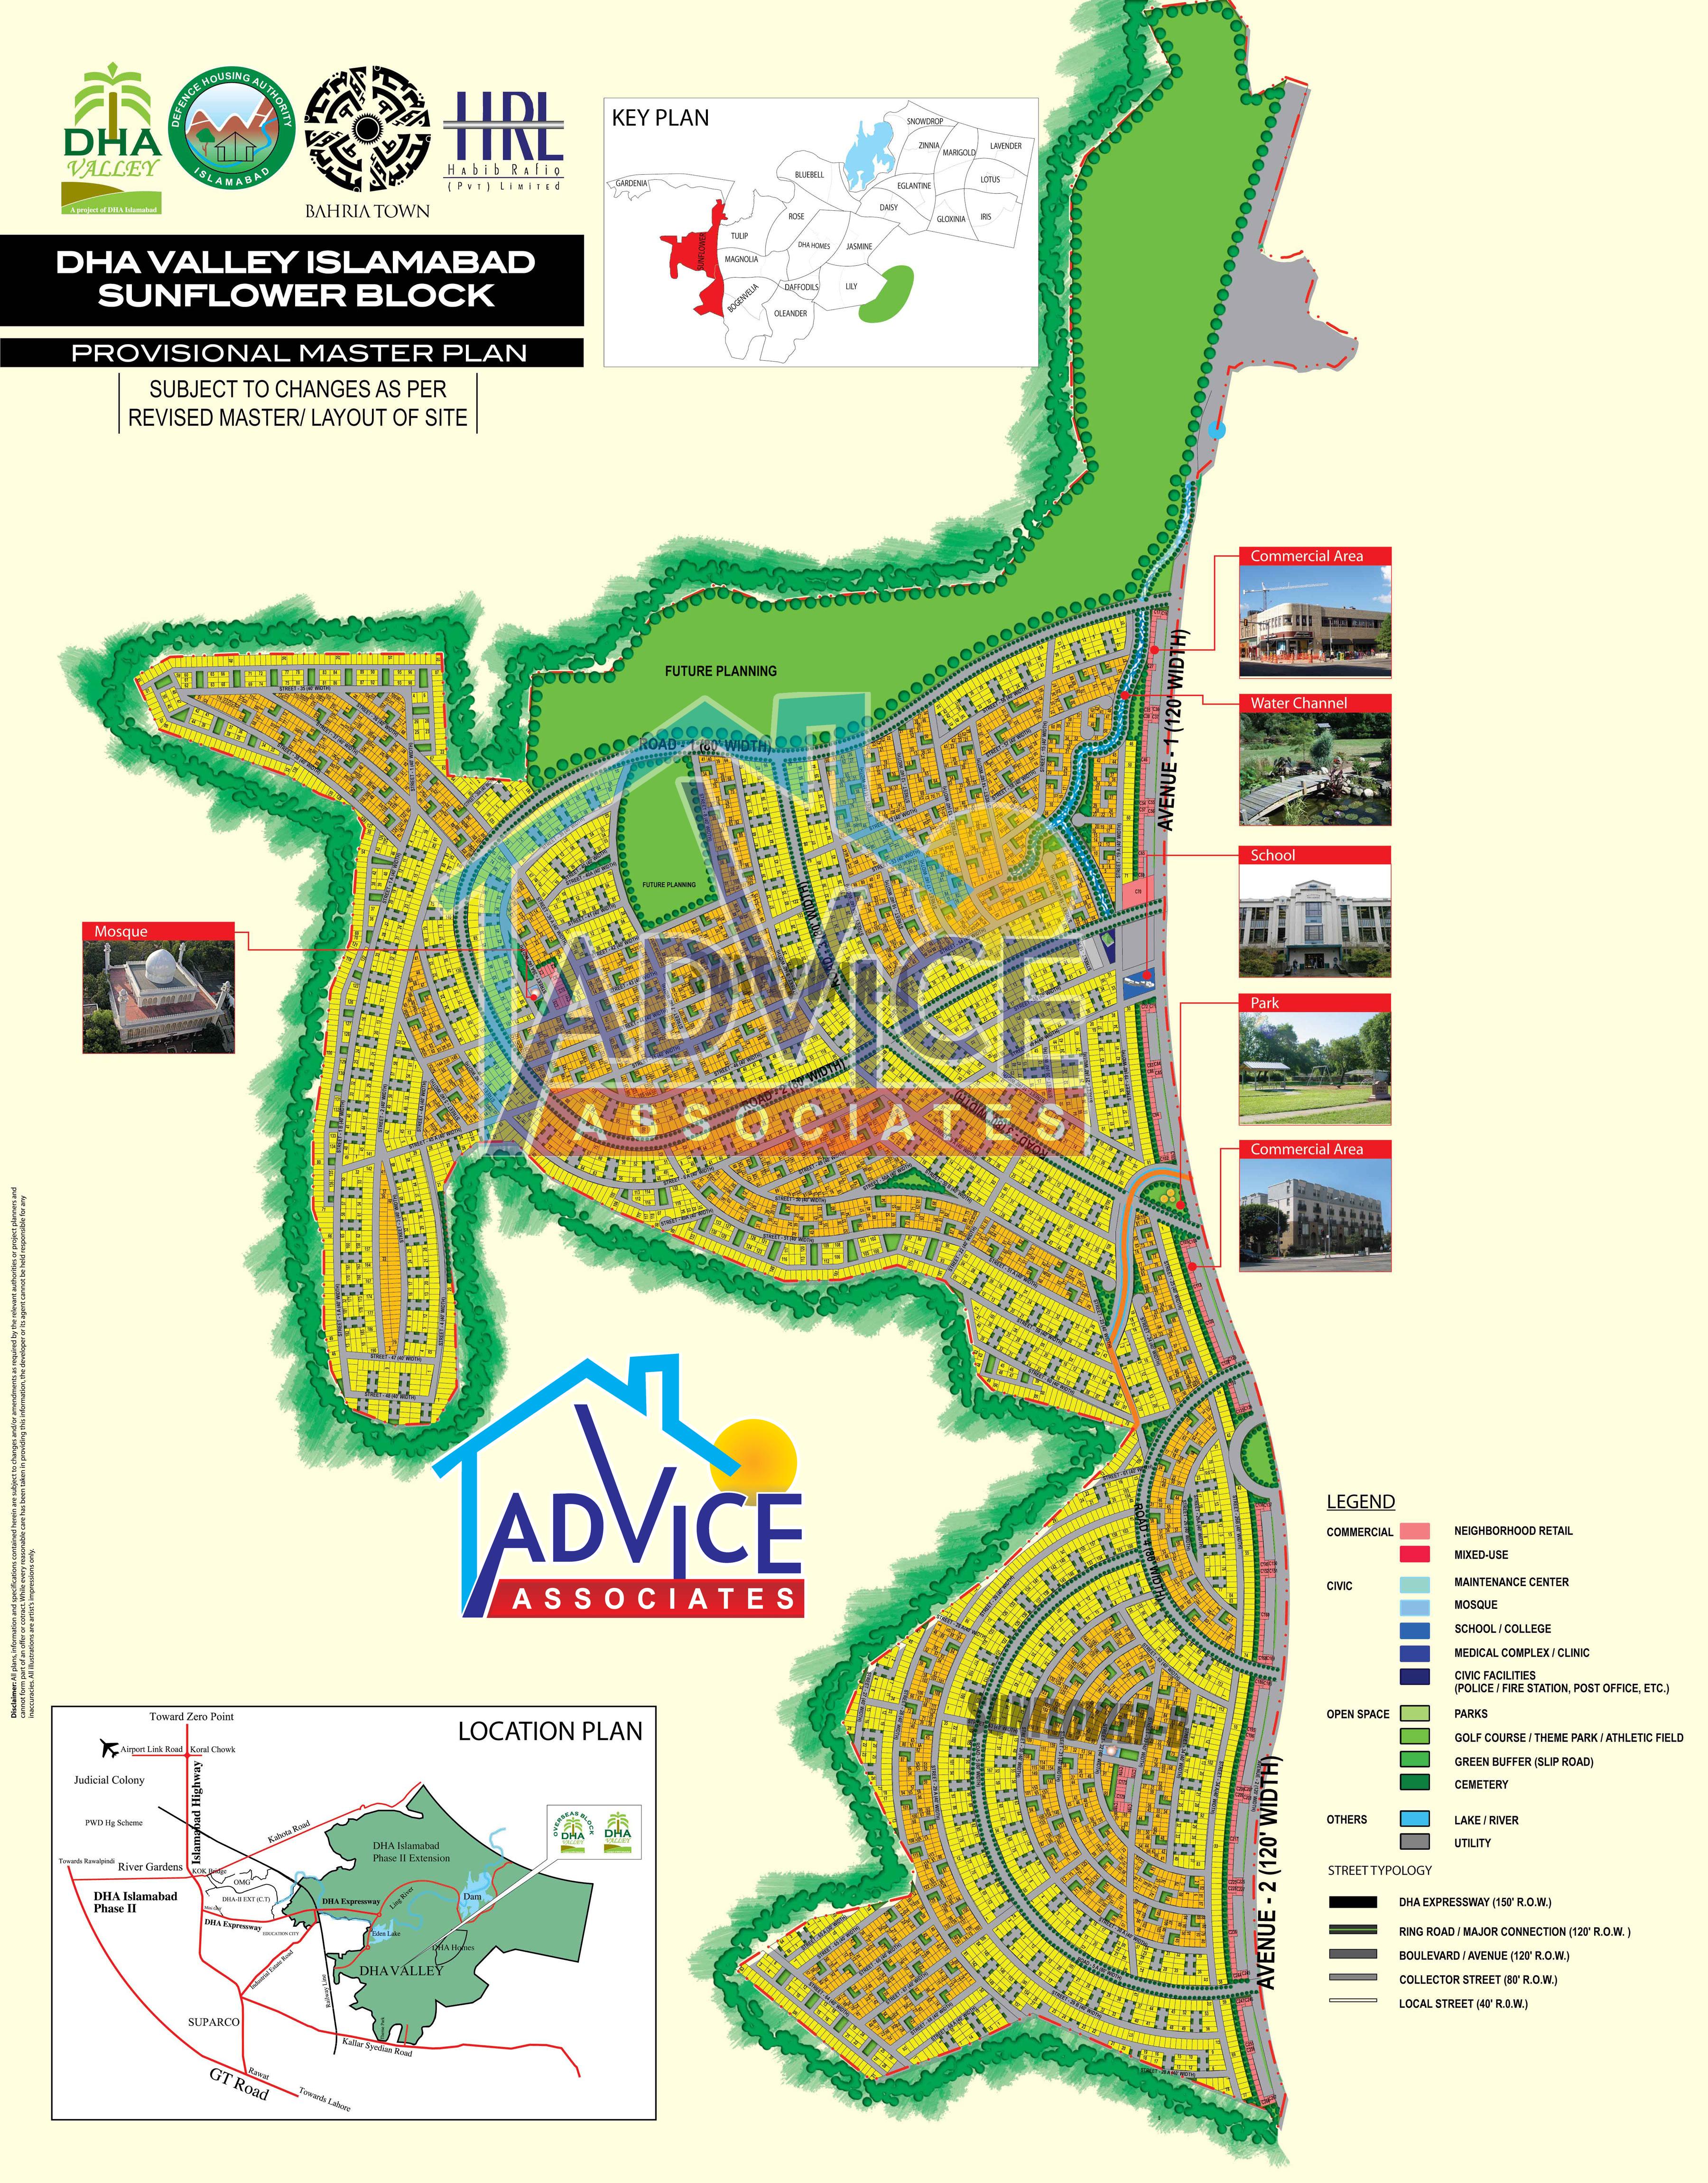 DHA Valley Islamabad Maps